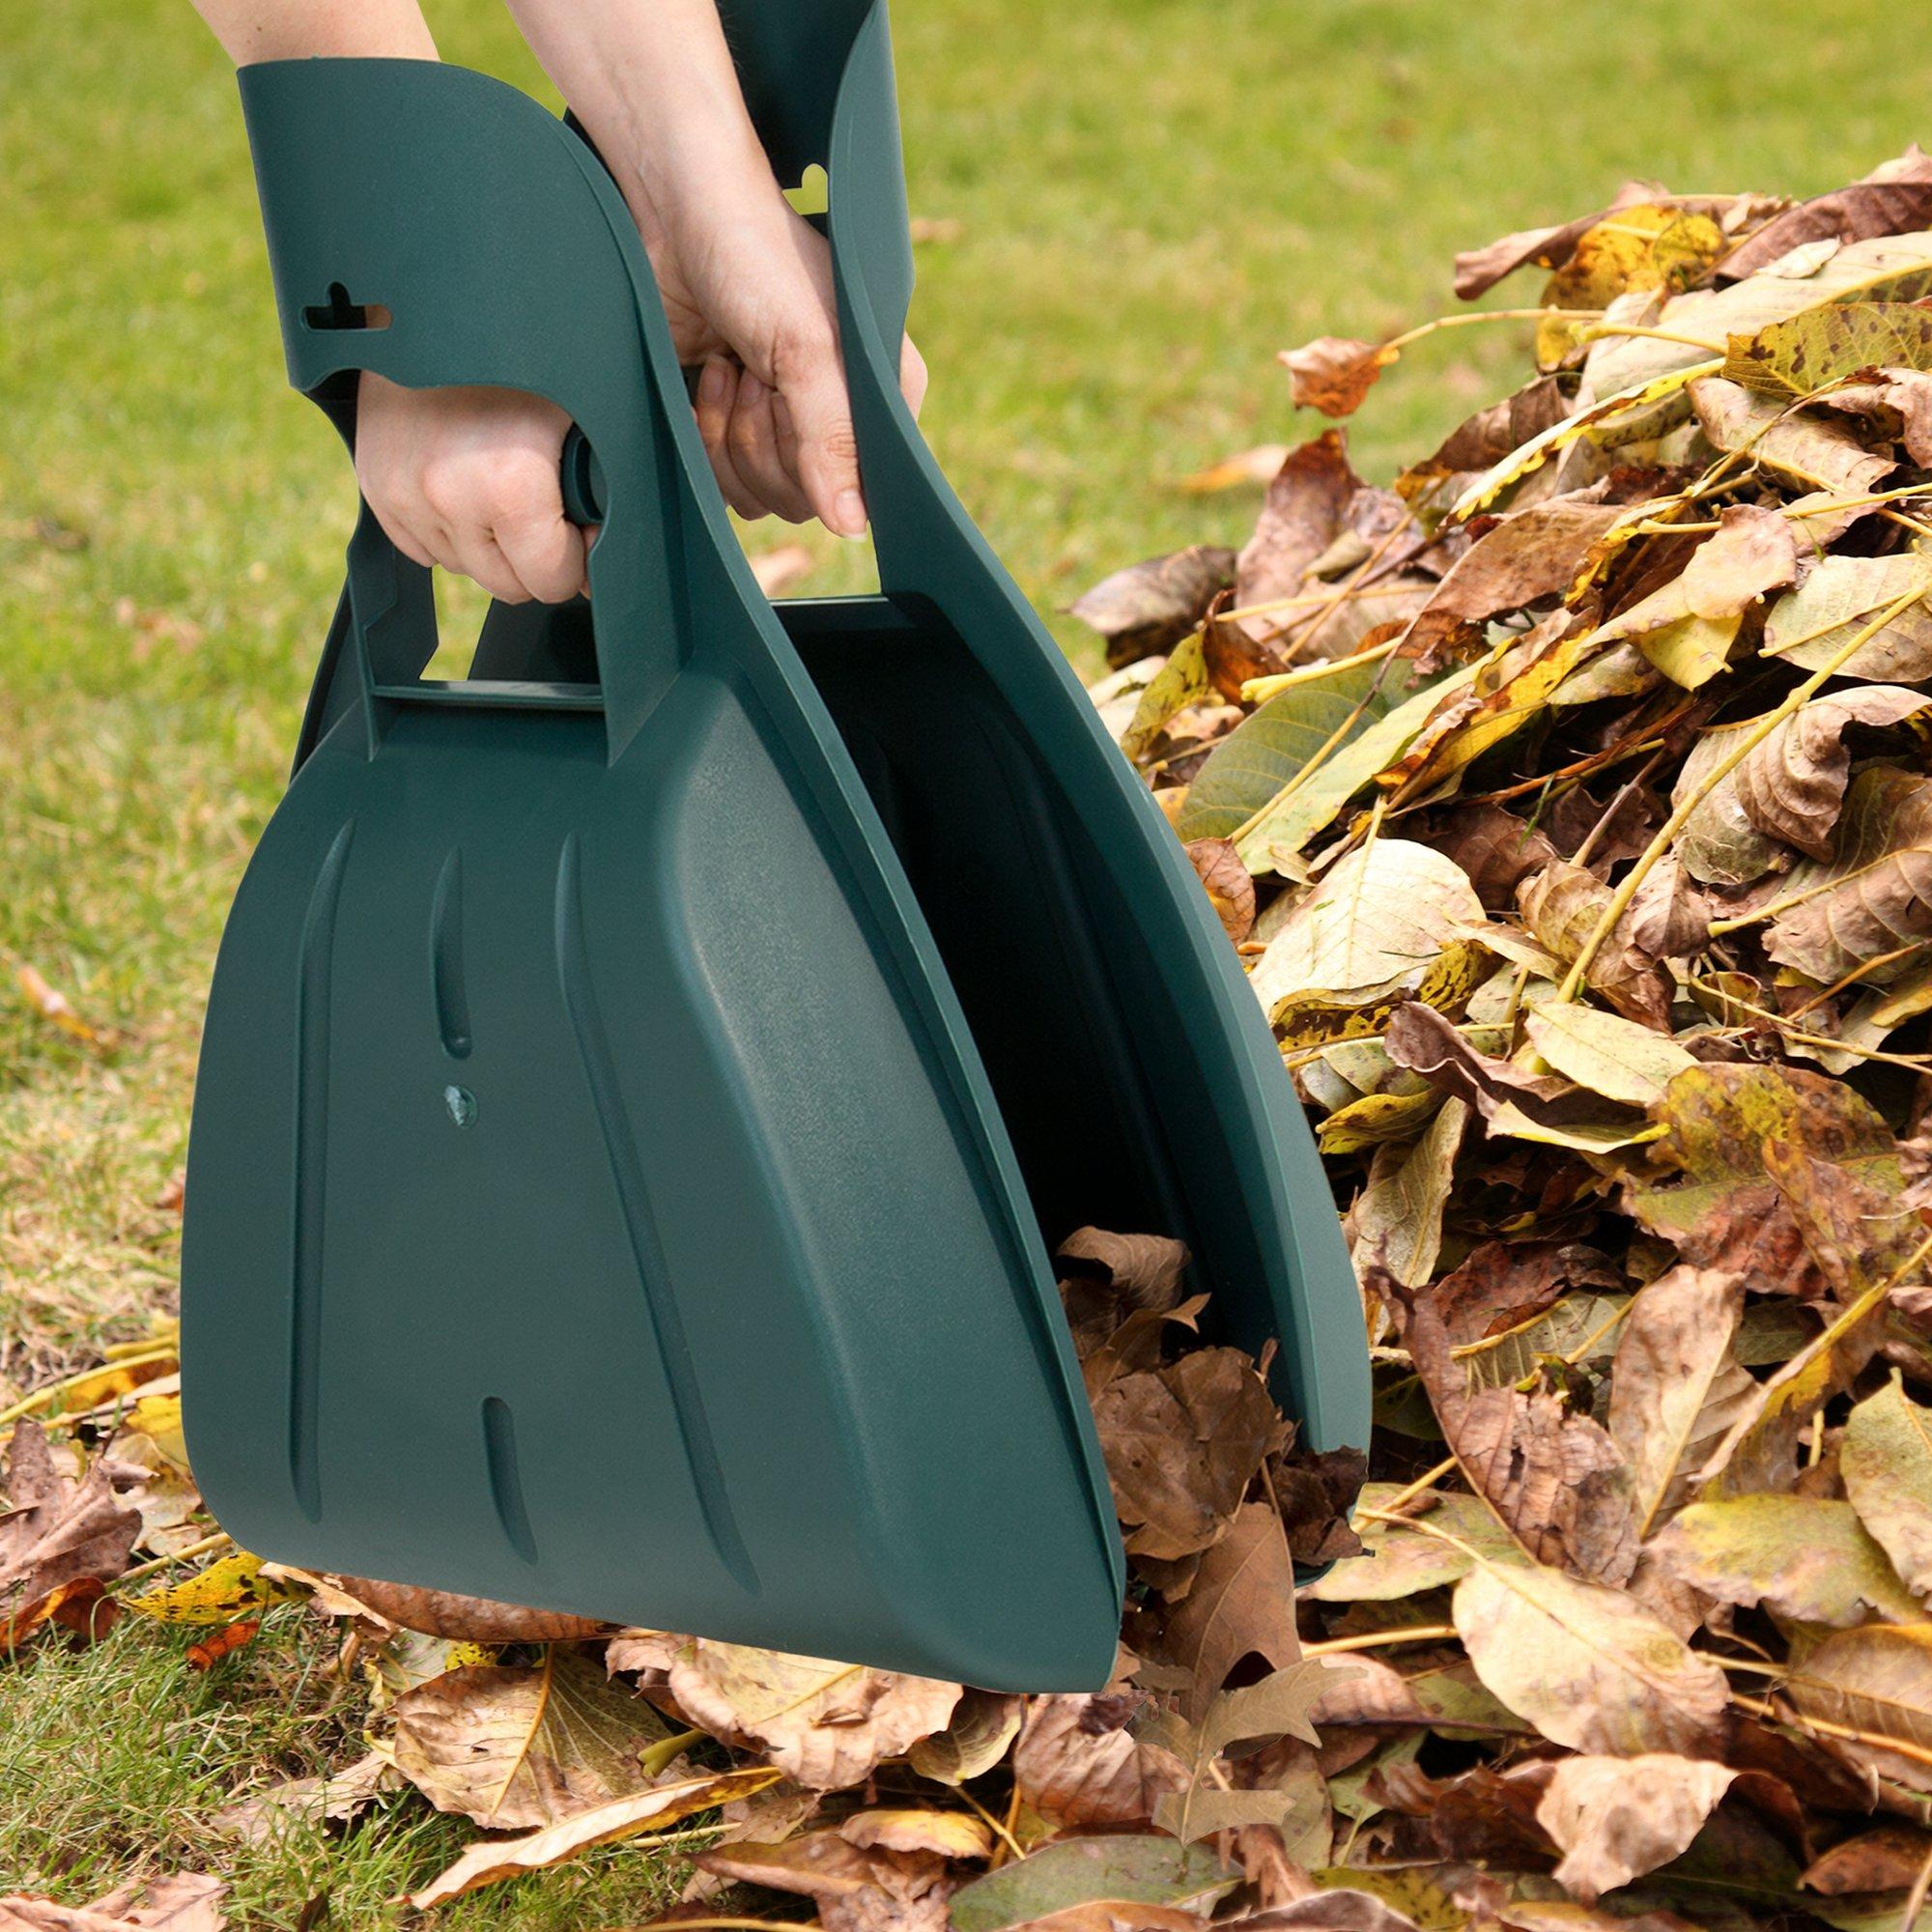 Pure Garden Leaf Grabber Hand Rake Claw- Lightweight, Durable Gorilla Garden Tool Scooping Leaves, Spreading Mulch, Yard Work More